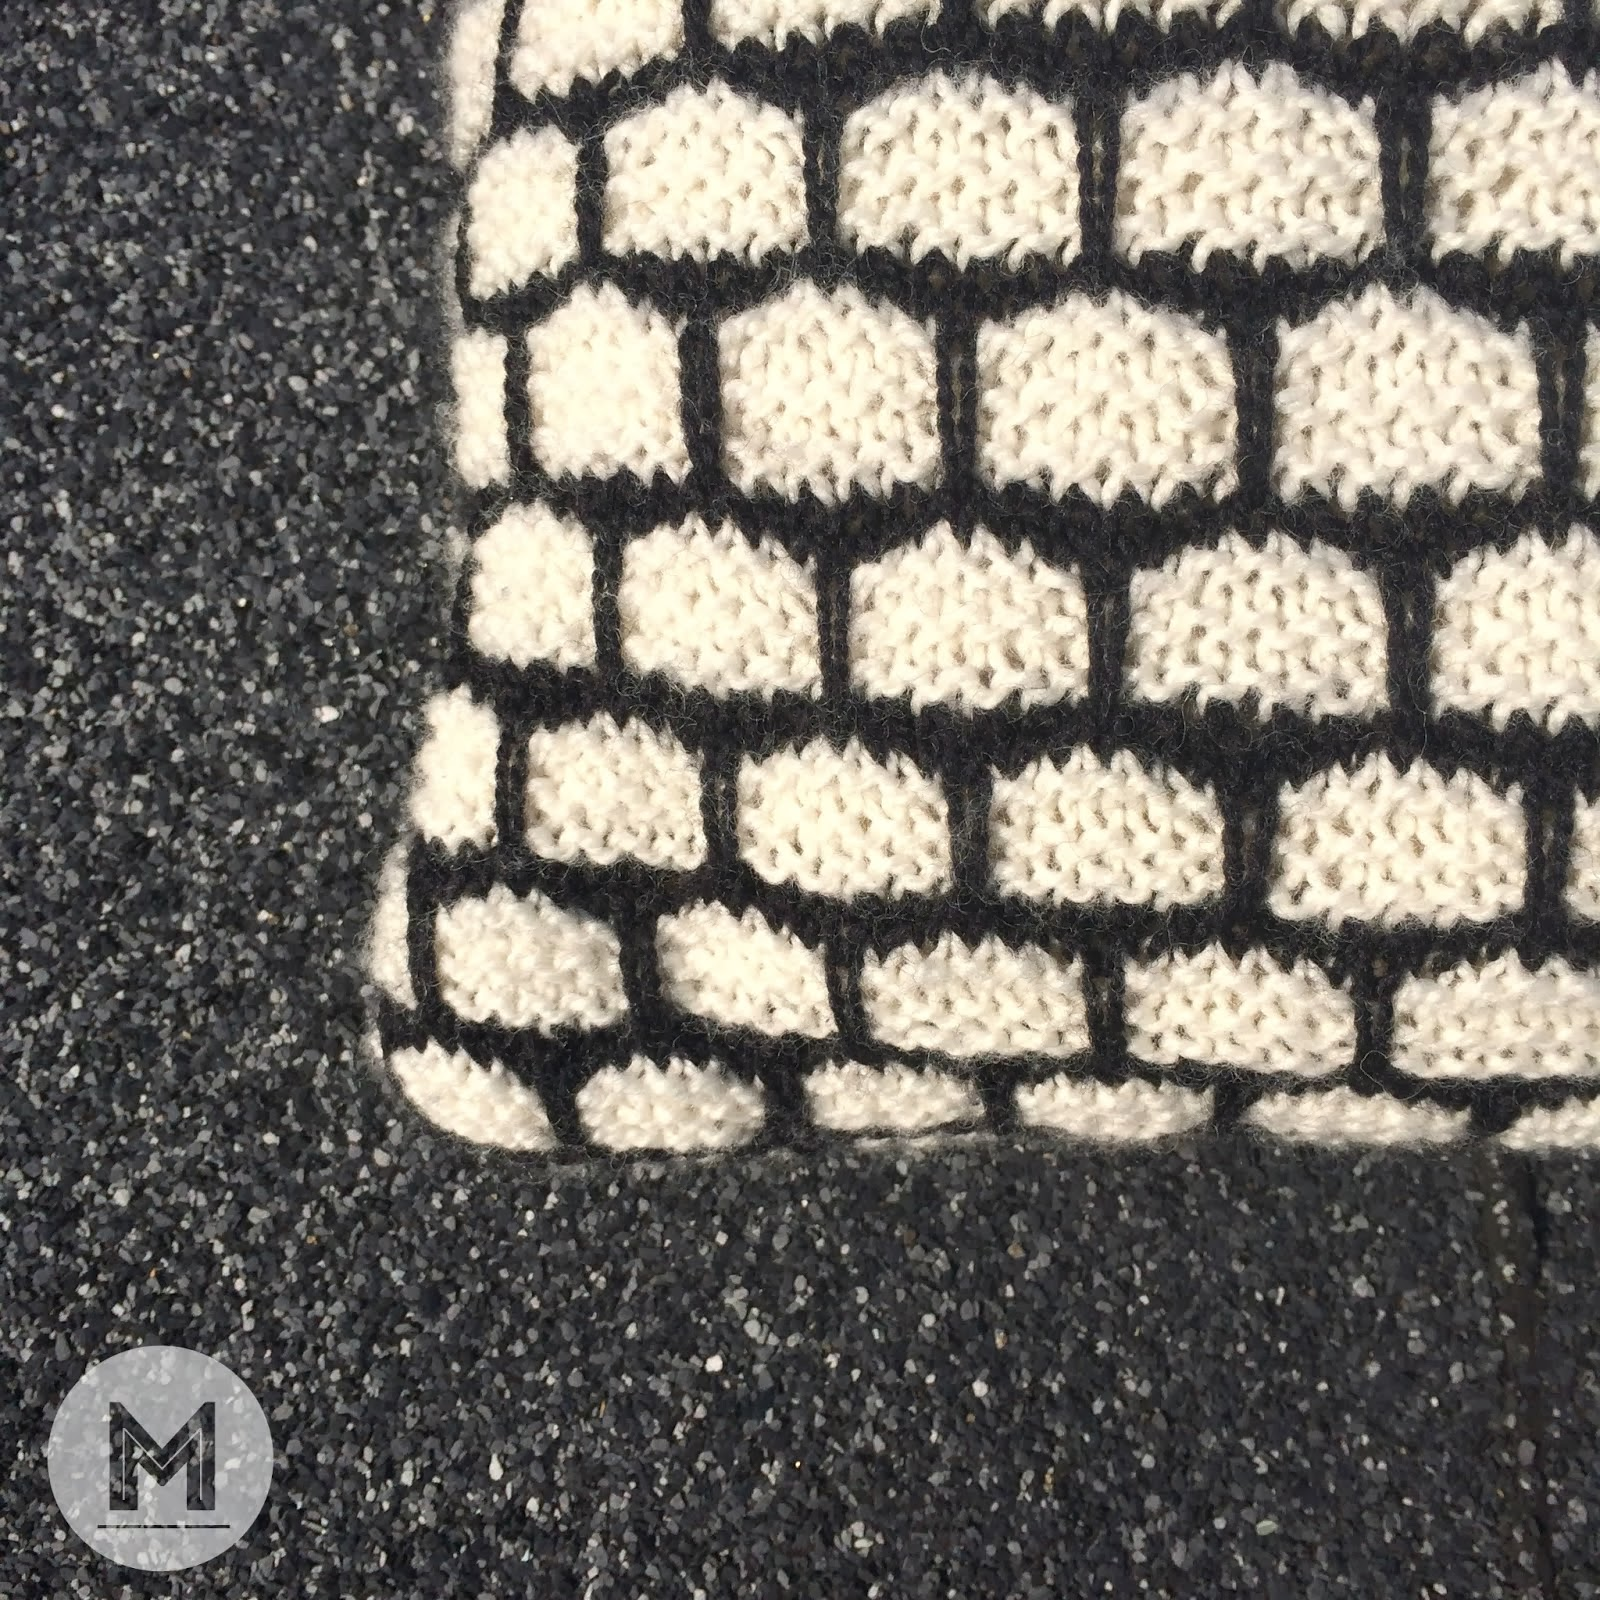 Easy knitting patterns from Trine Kok, Meraki. (danish)